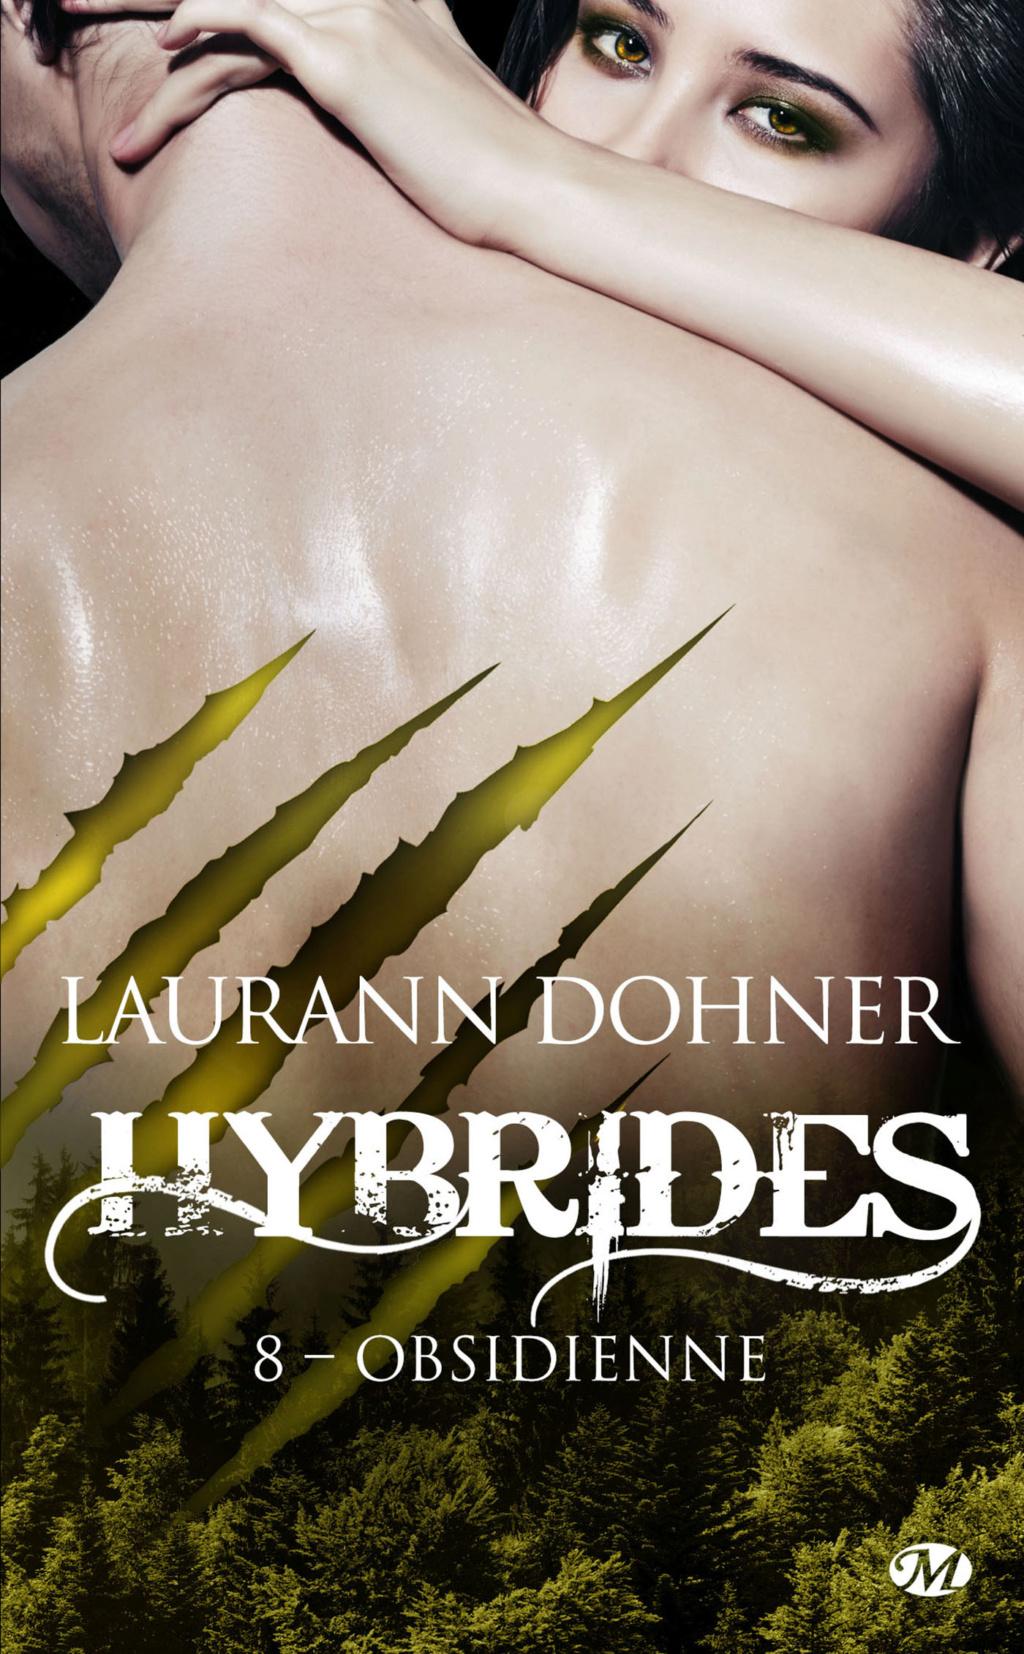 Hybrides - Tome 8 : Obsidienne de Laurann Dohner Hybrid10